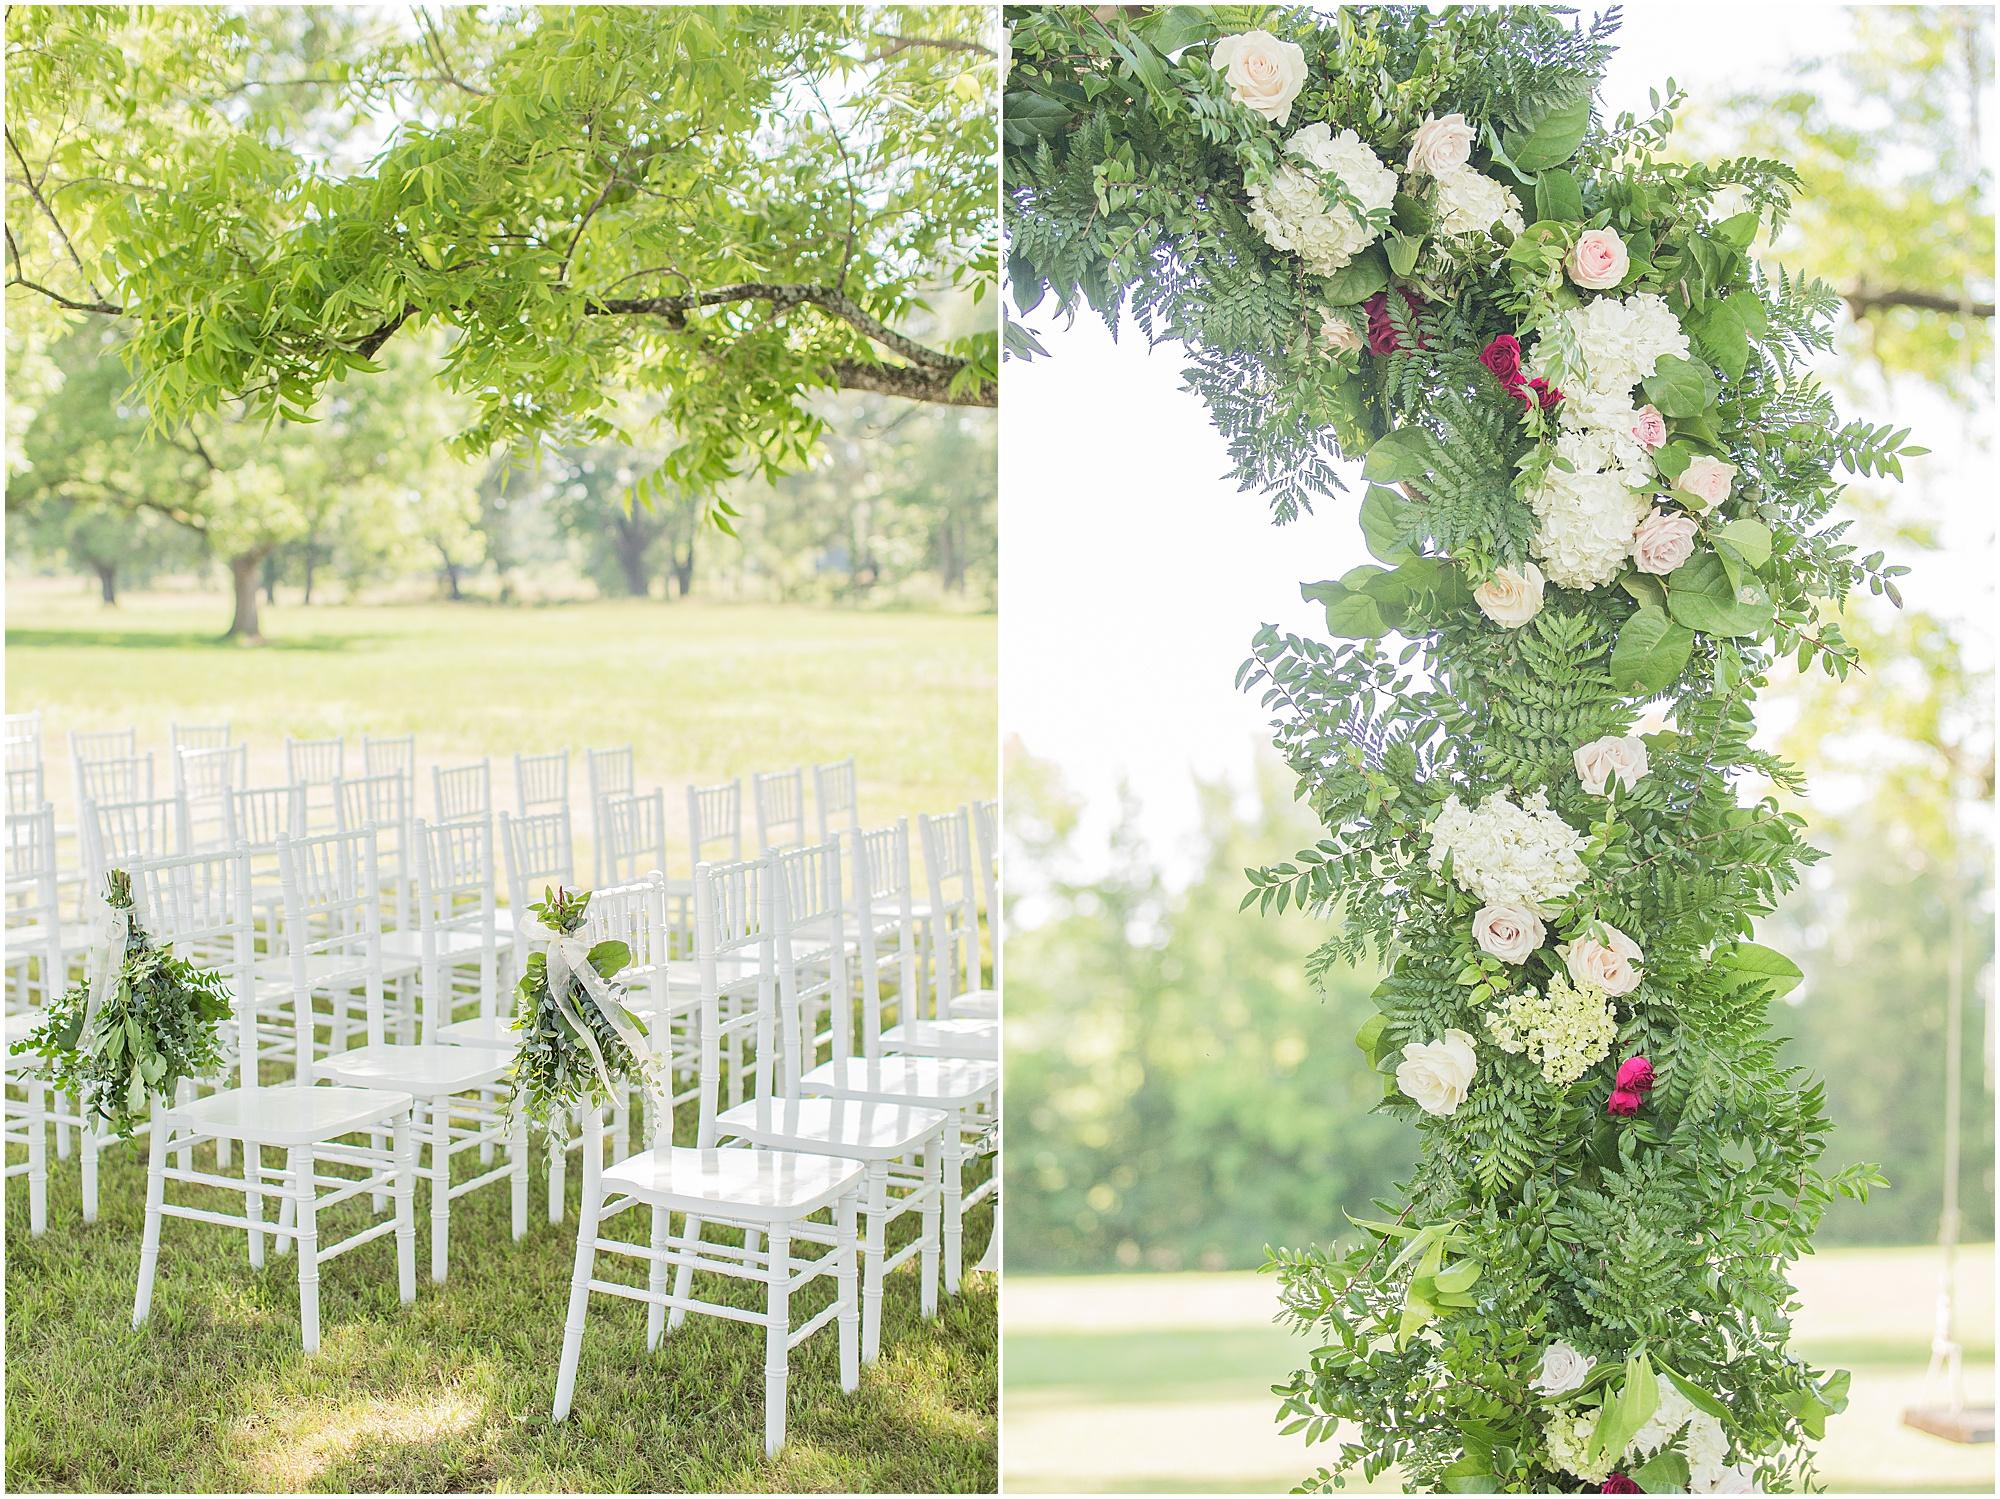 starkville-mississippi-wedding-page-place-dodson-farms_0052.jpg